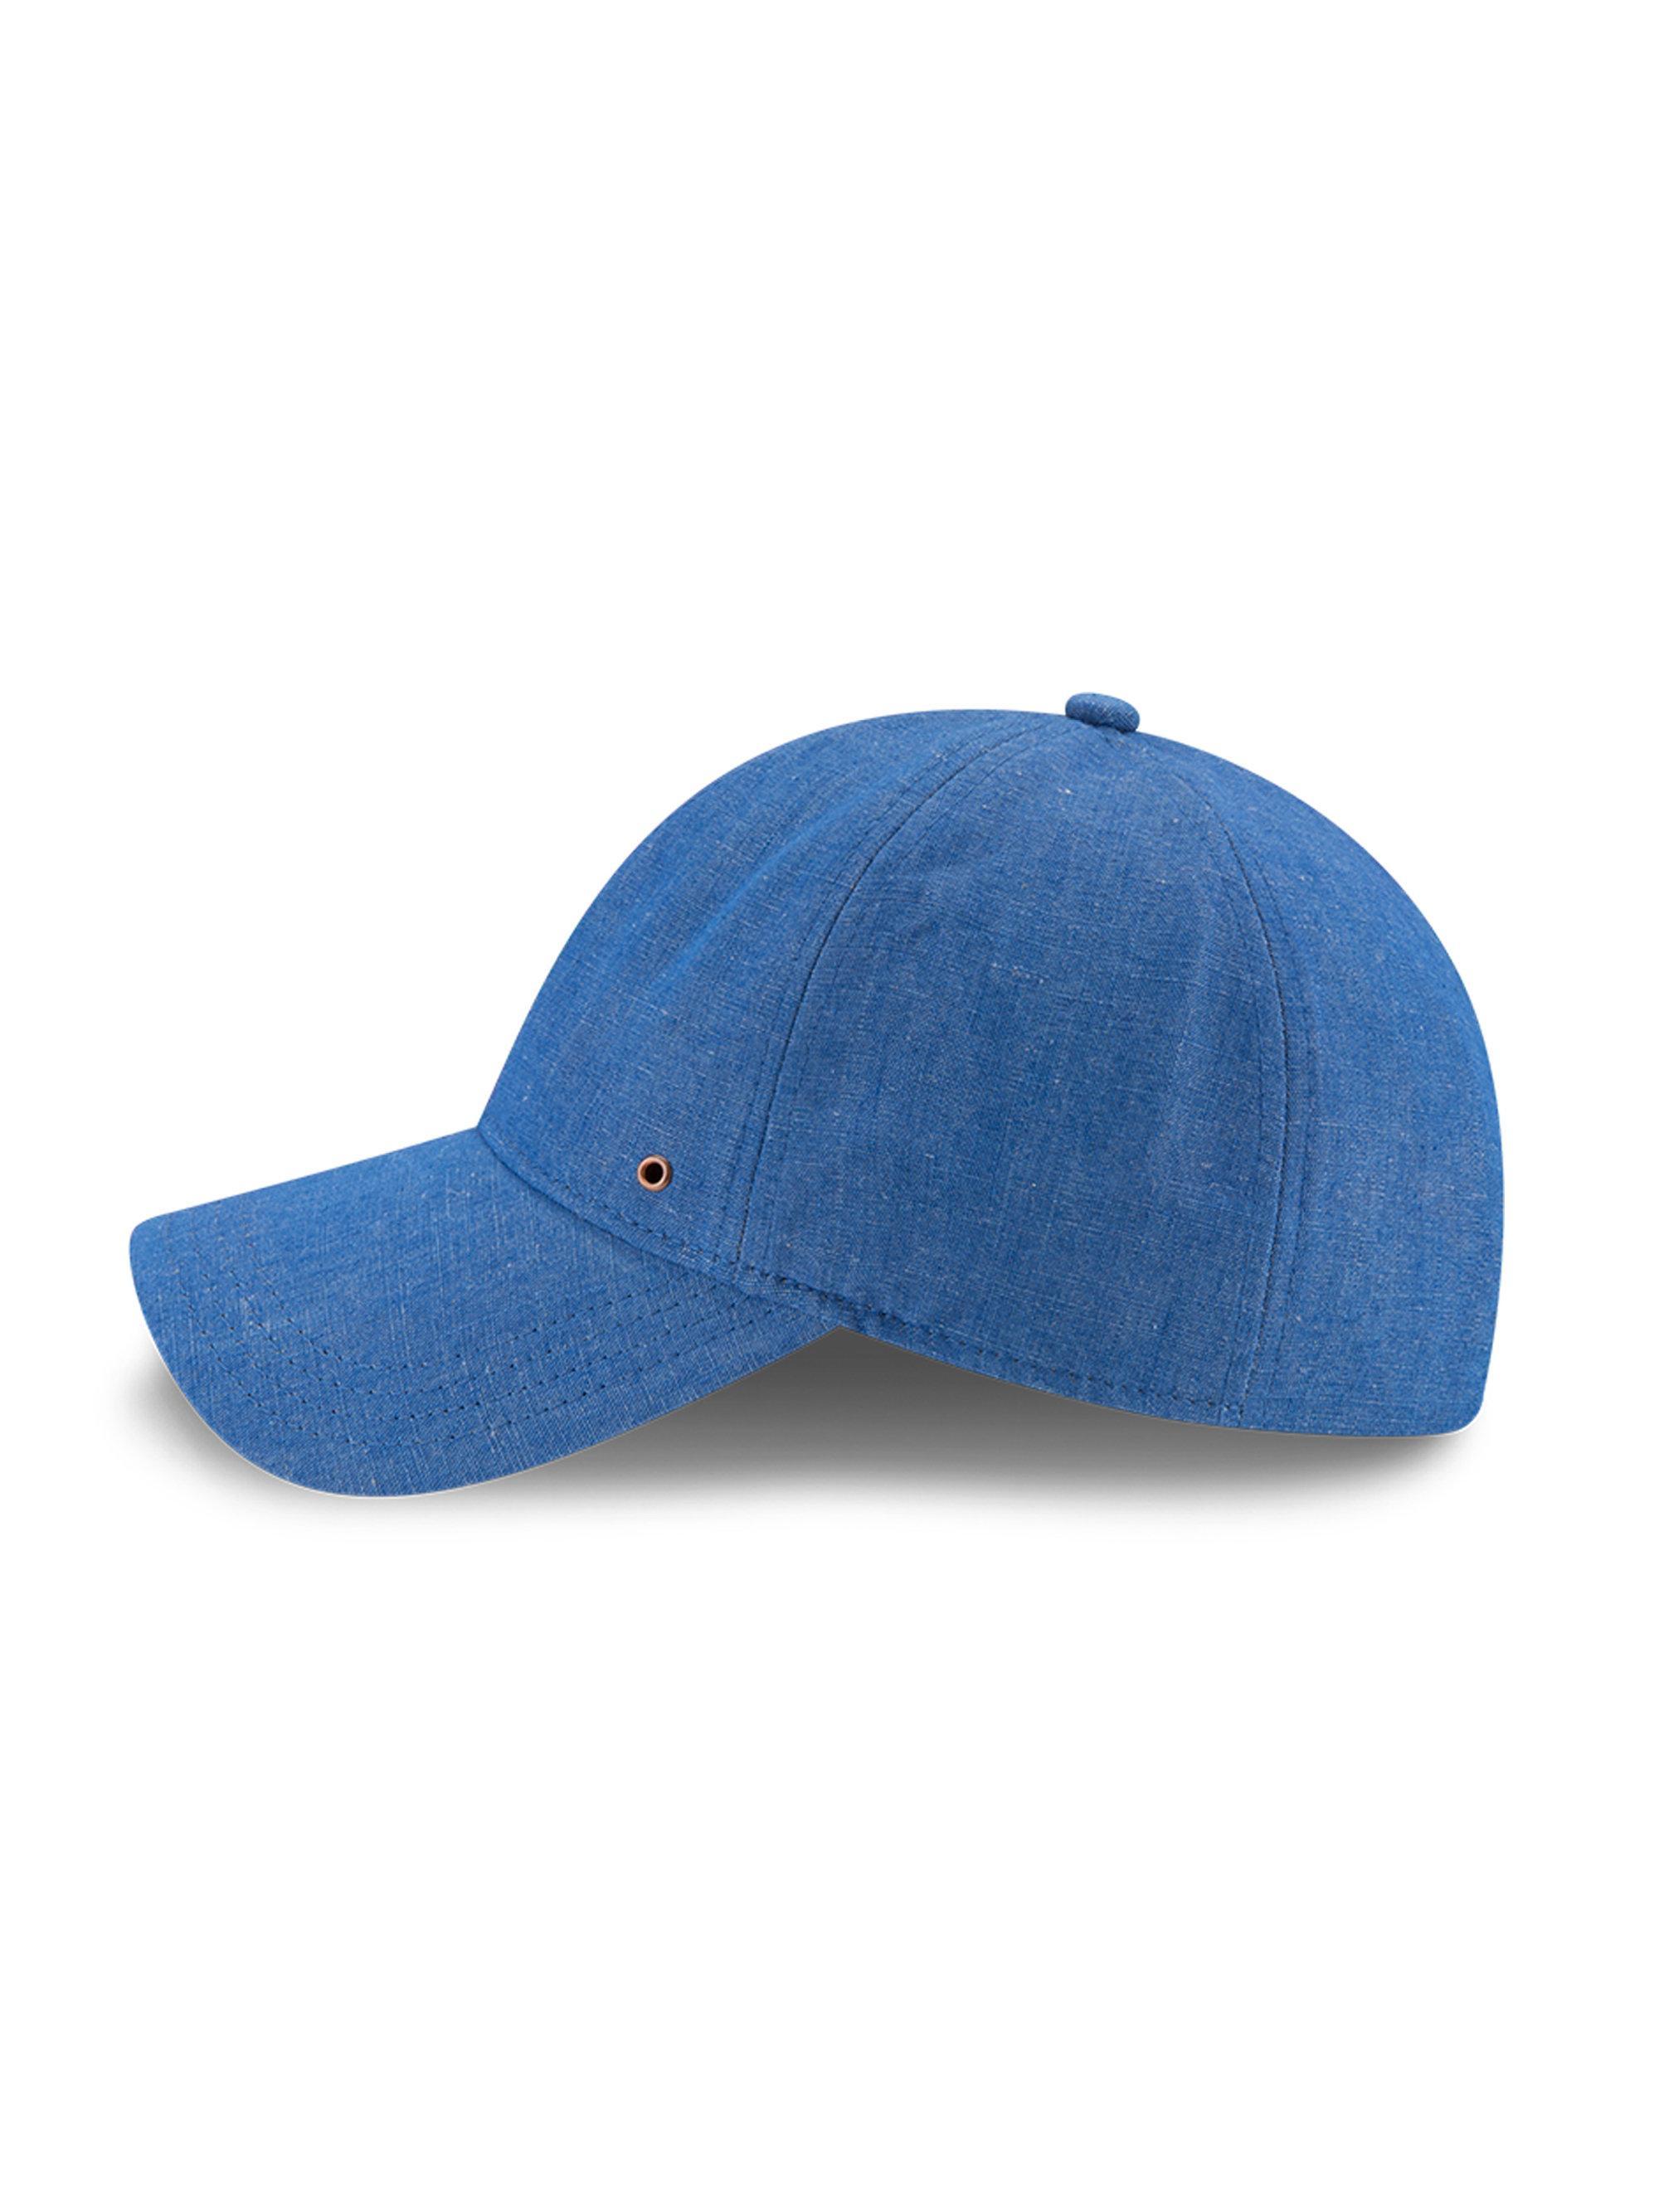 61cec991d21 KTZ - Blue Cotton Baseball Cap for Men - Lyst. View fullscreen